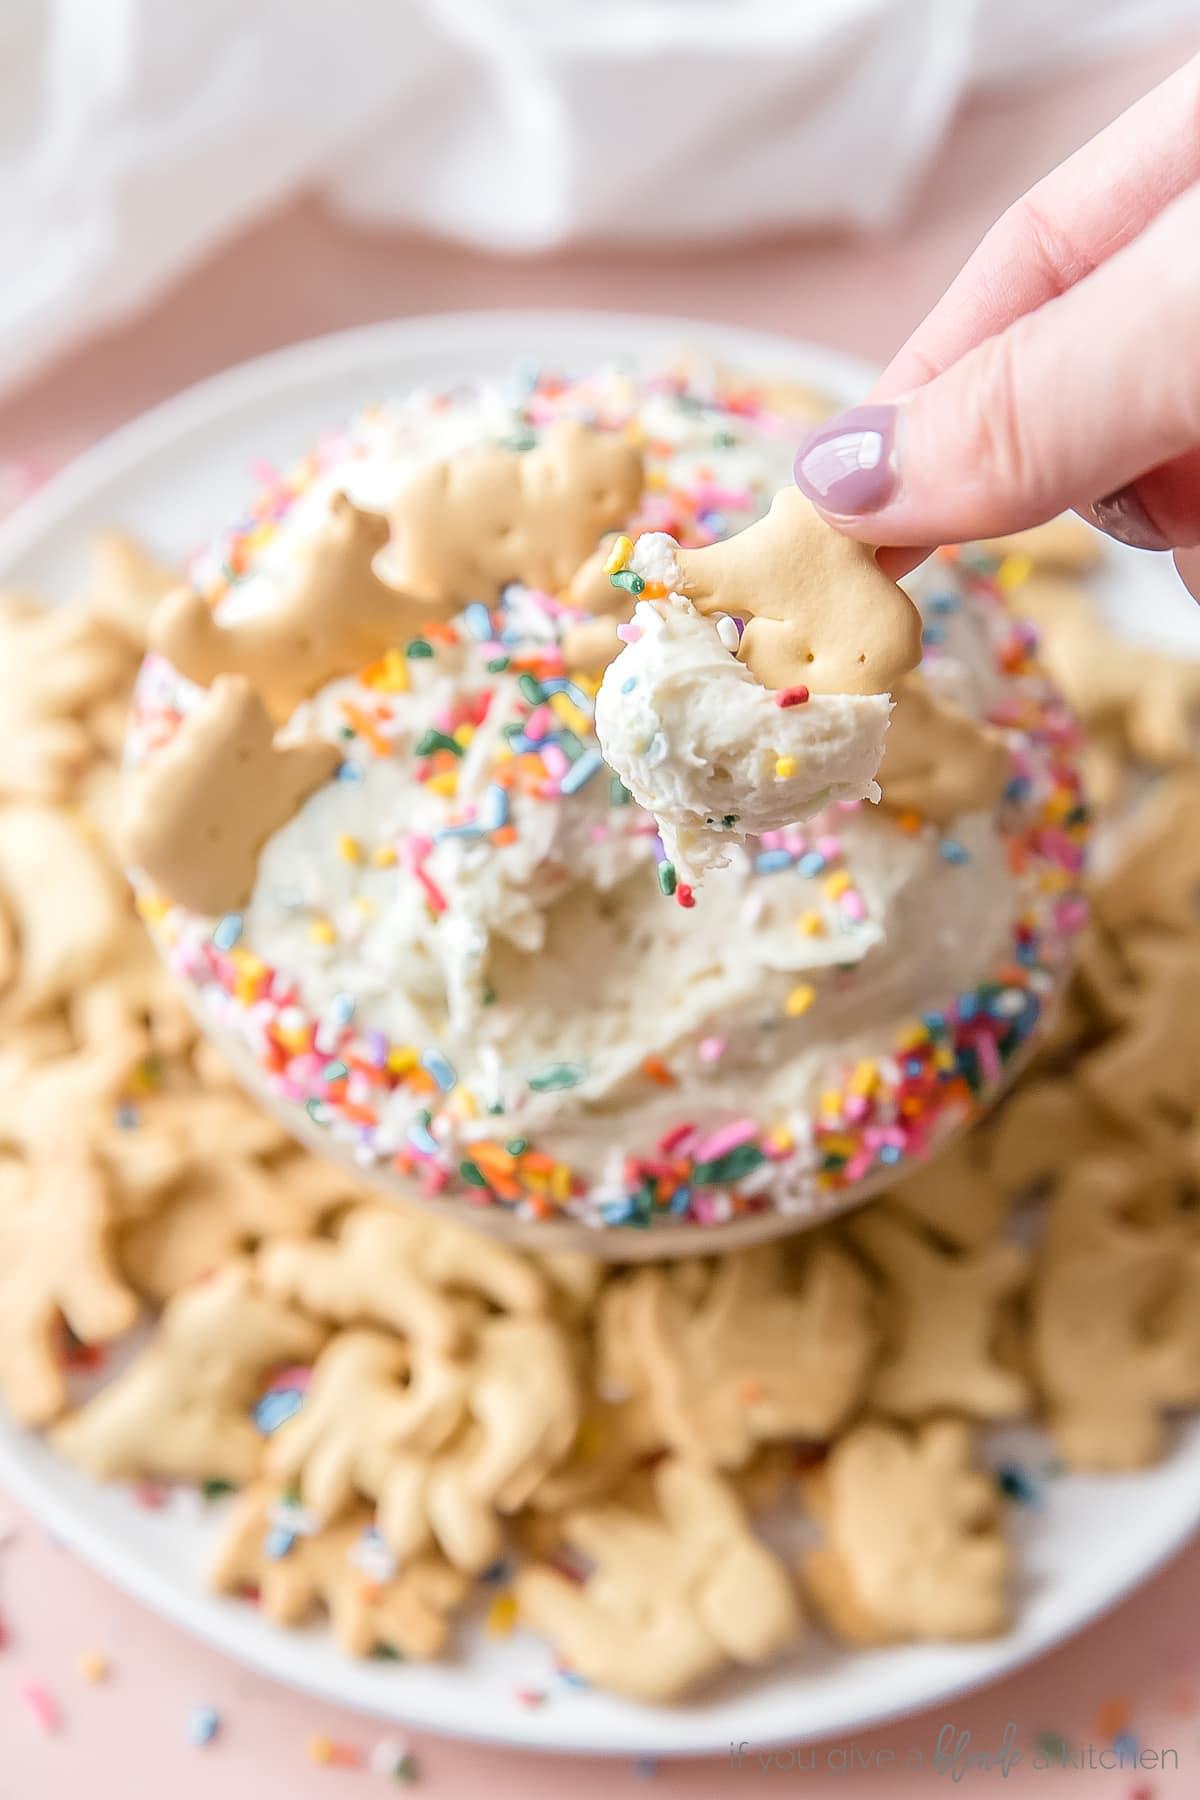 hand dipping animal cracker in funfetti dip